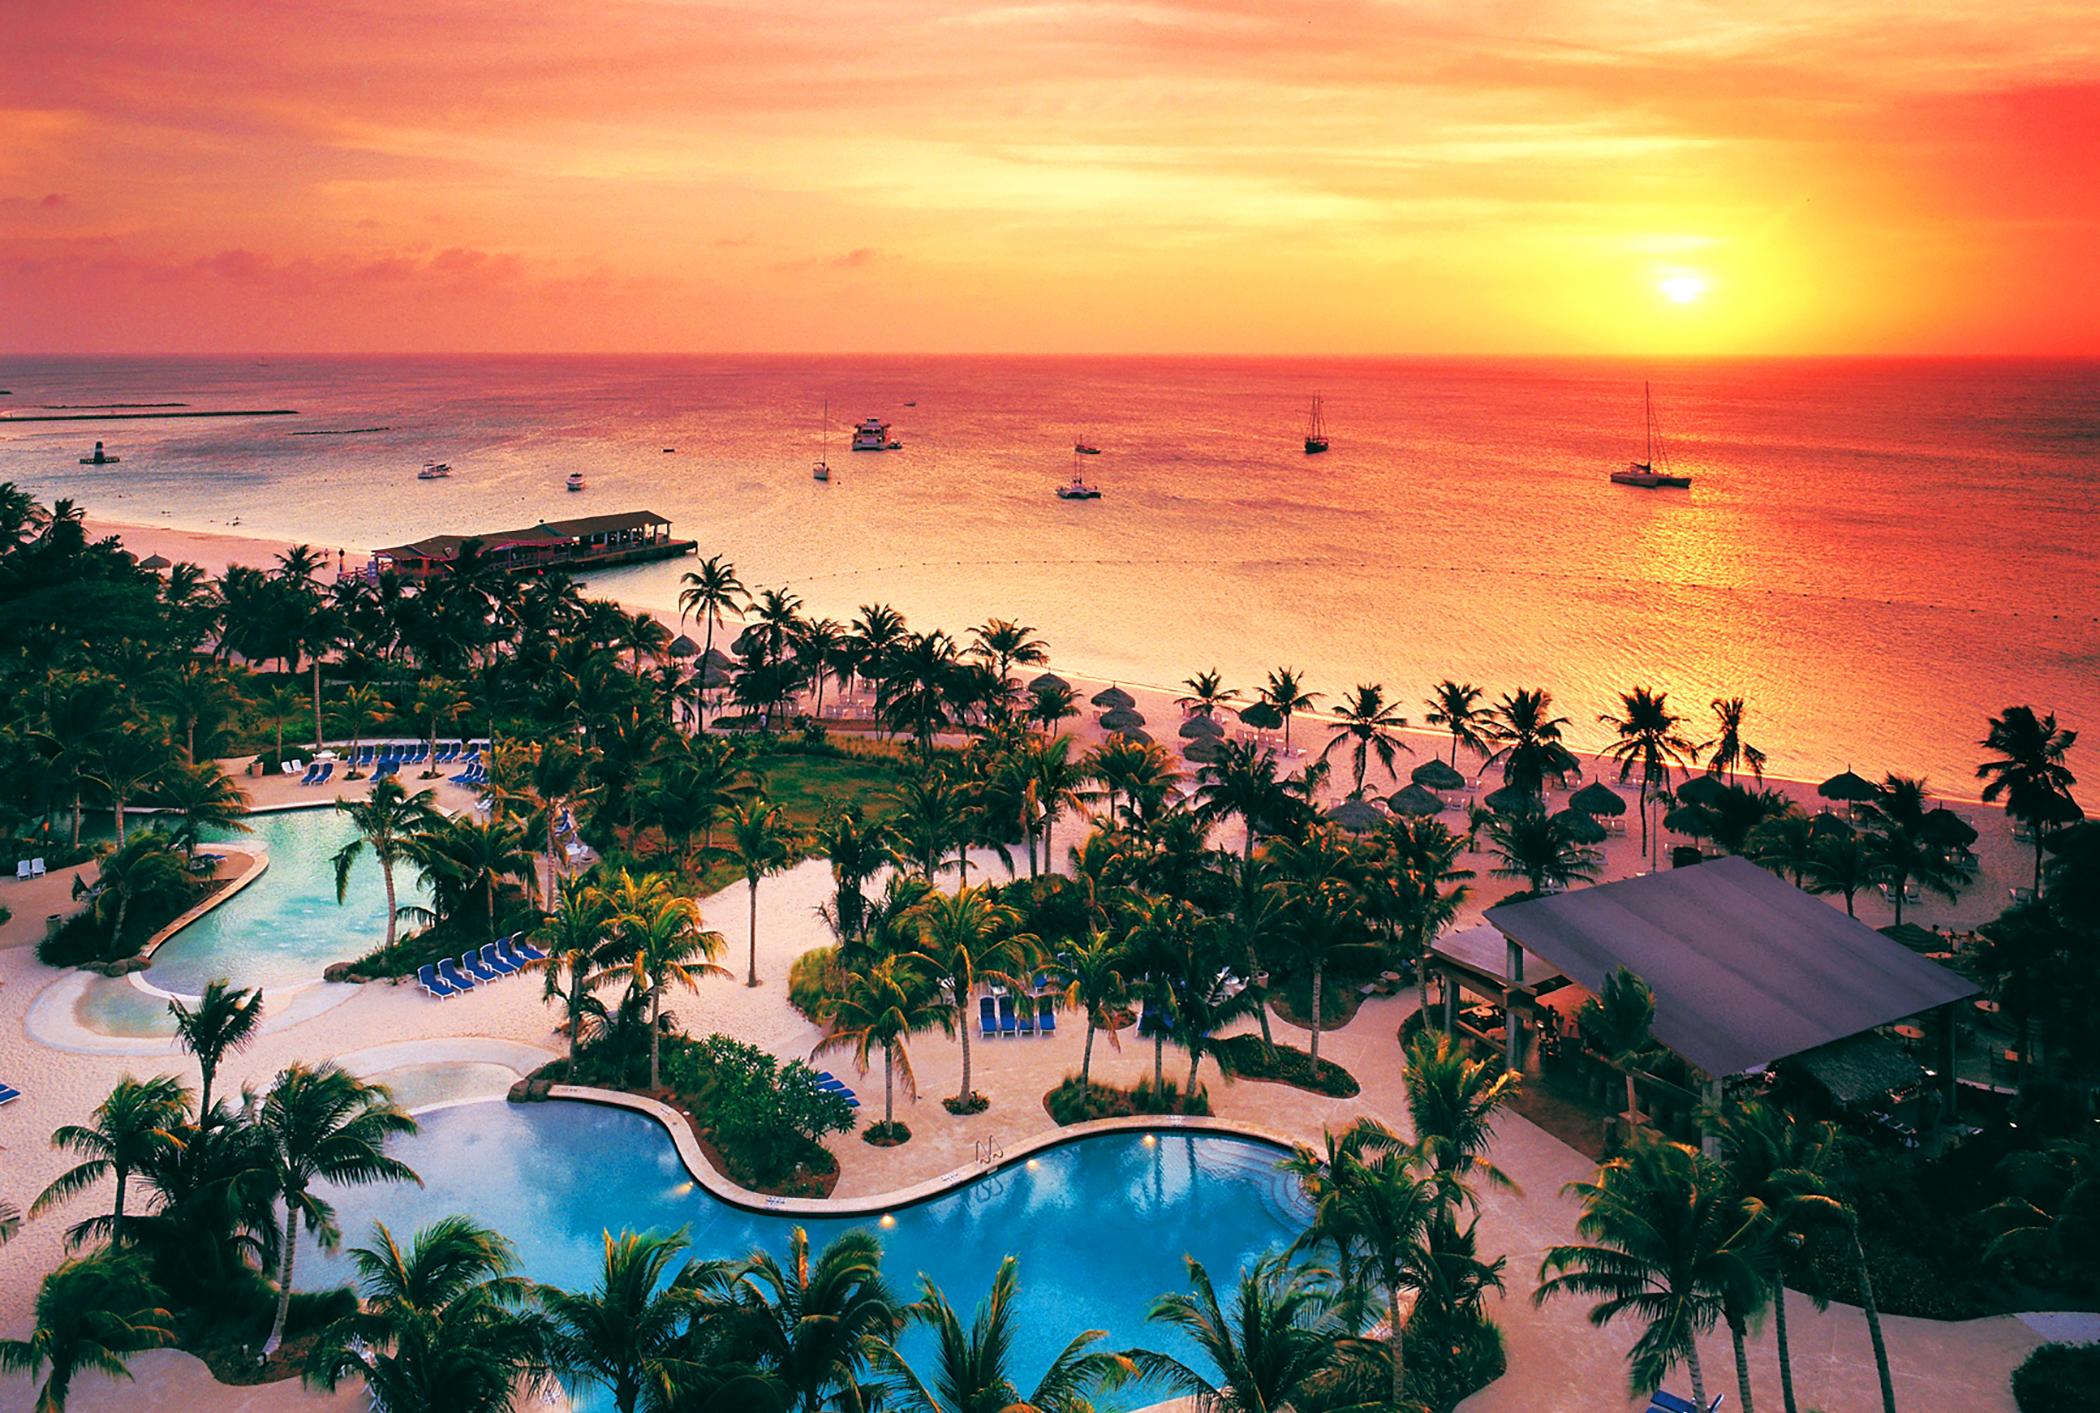 The Hilton Aruba, where rates are 45% less before Christmas week.